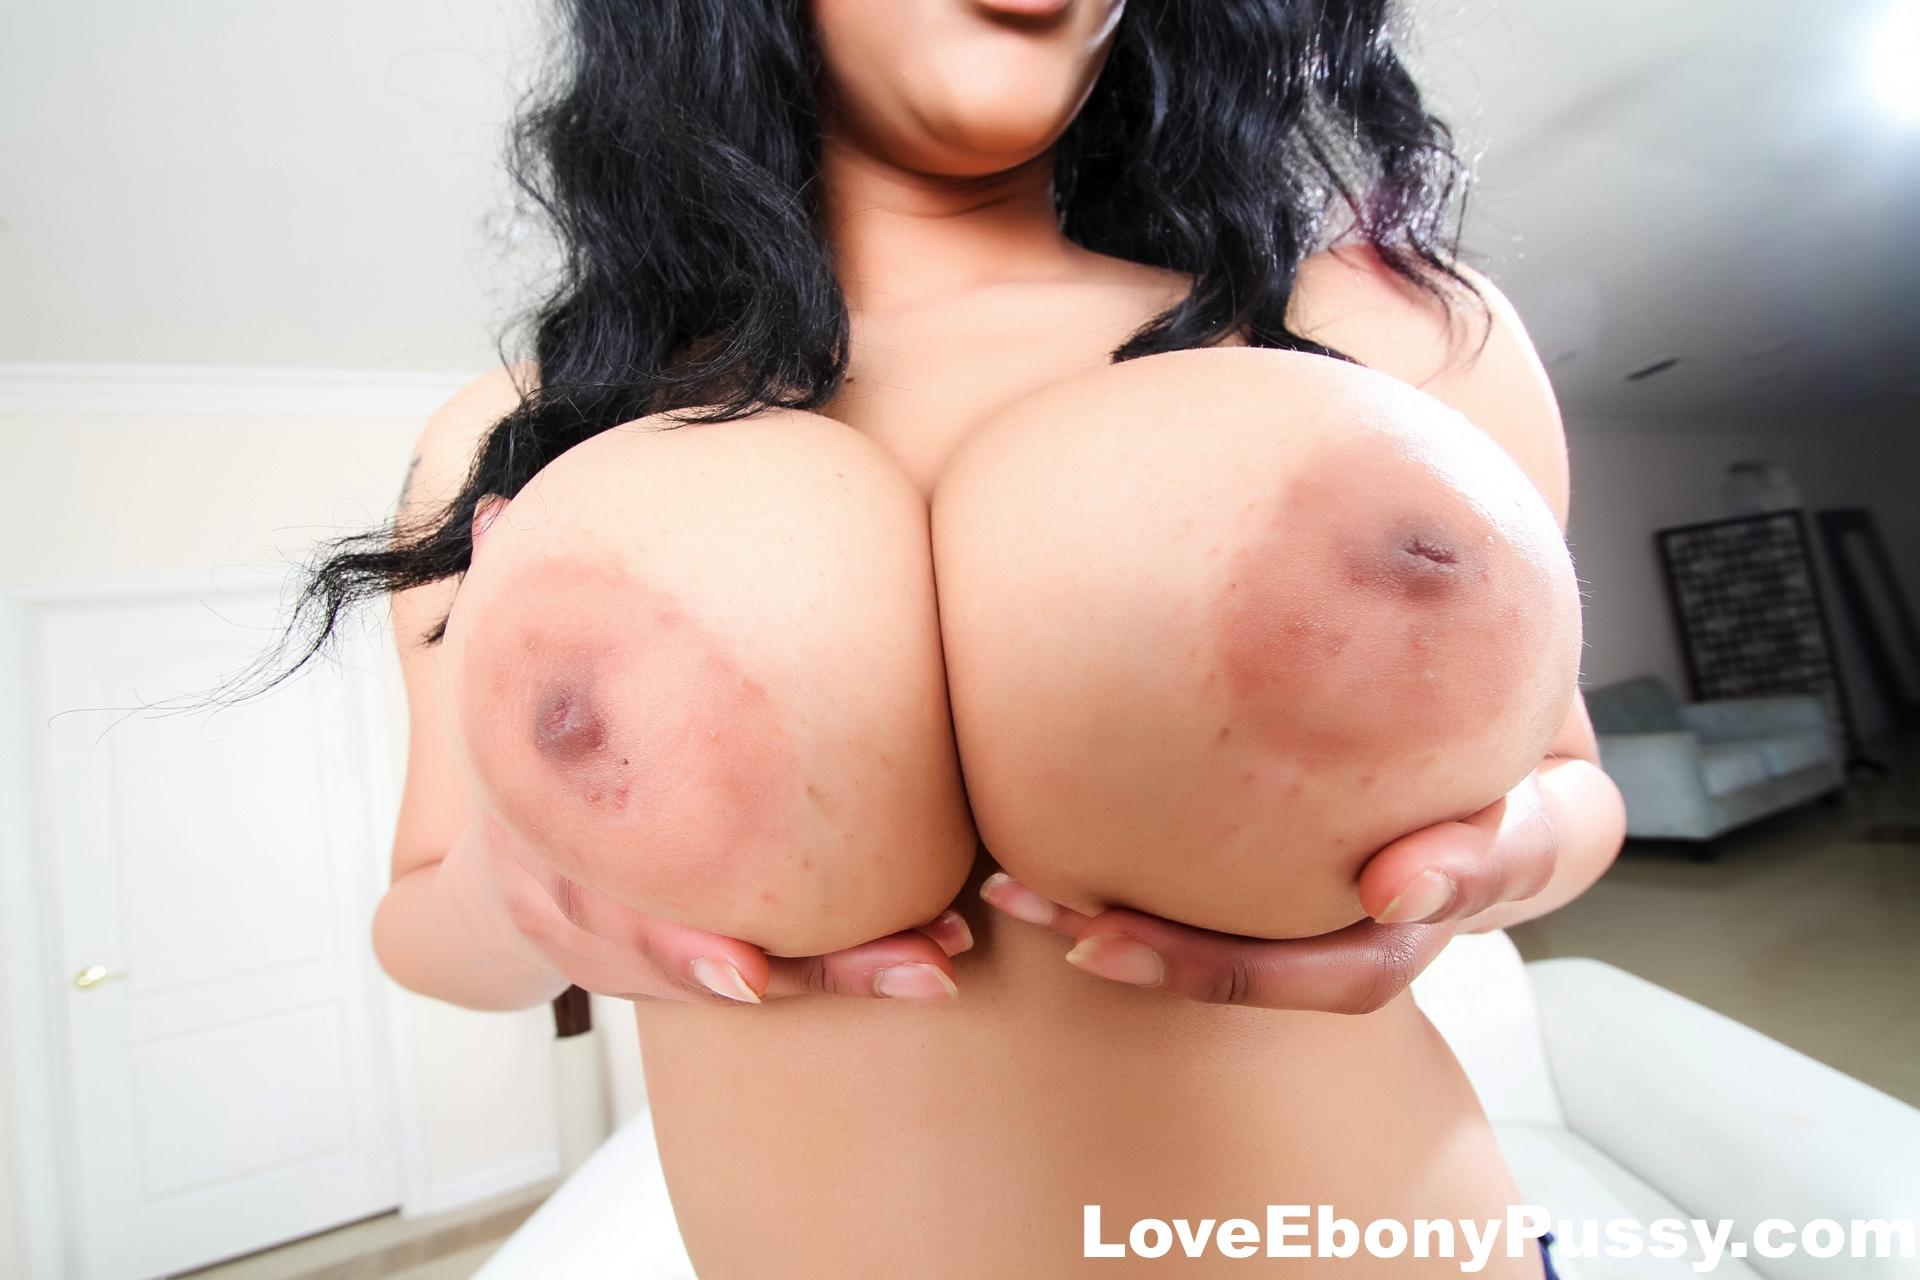 Busty hot babe gets an orgasm 9